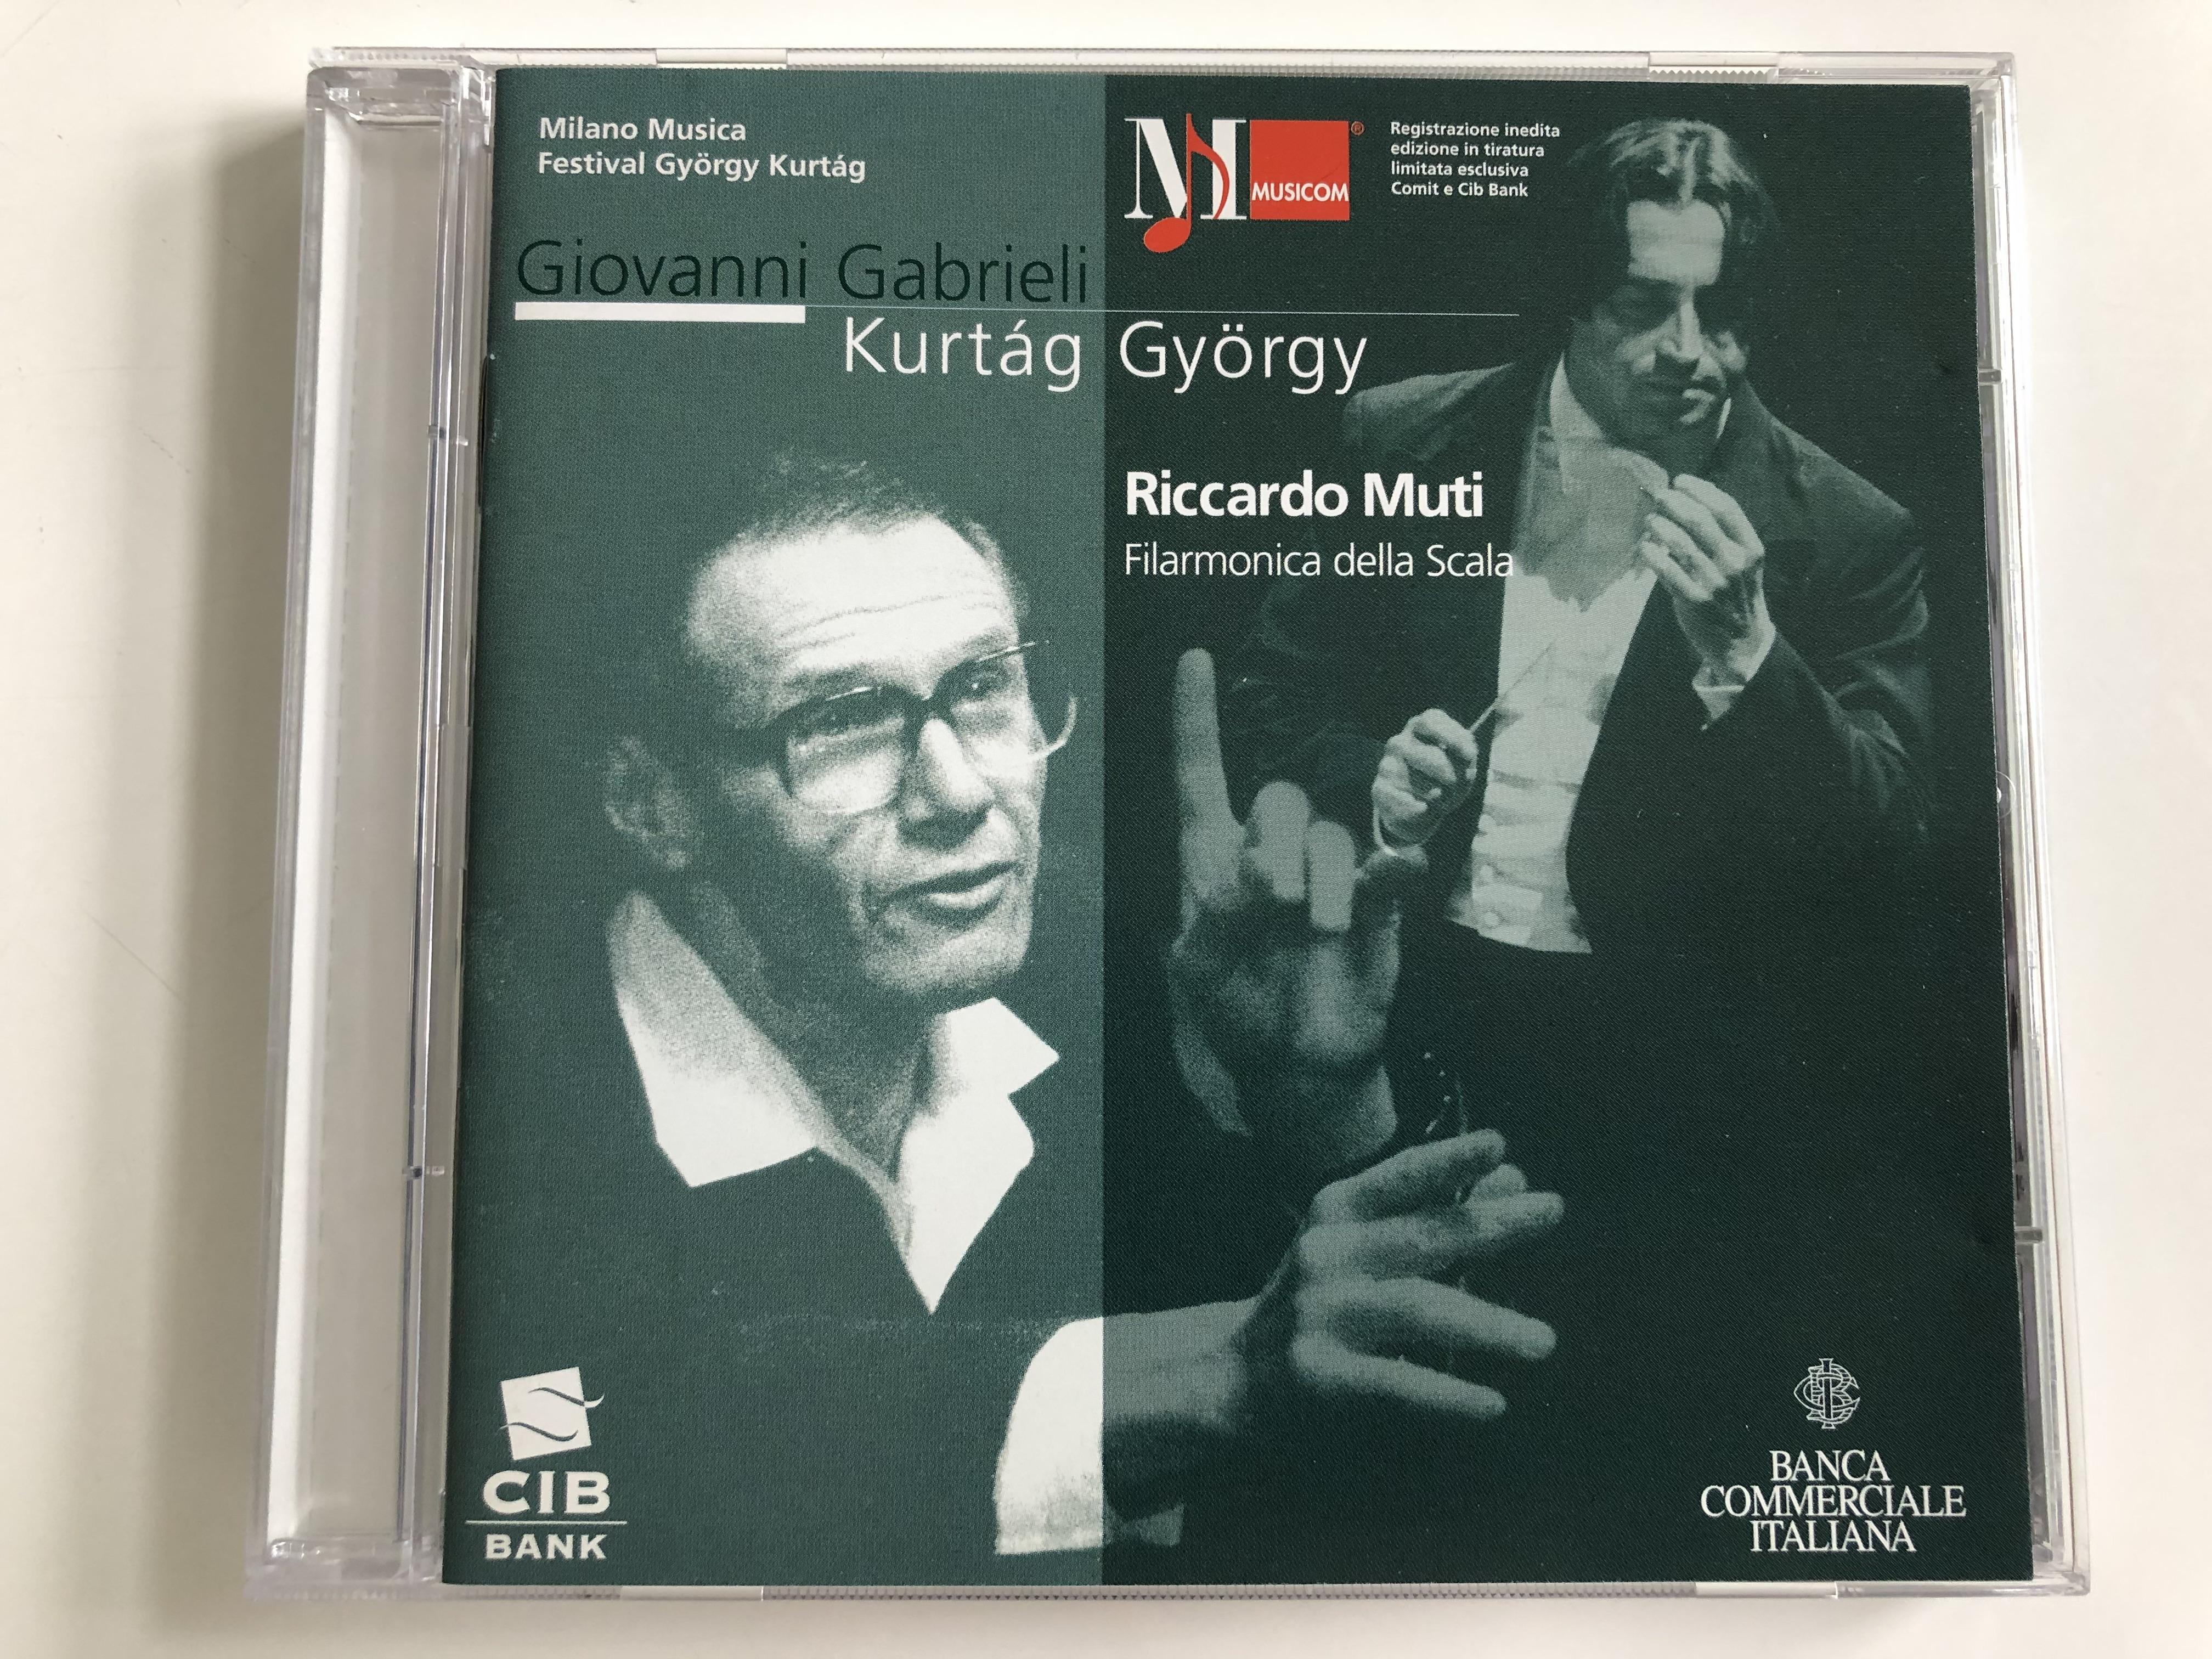 milano-musica-festival-gy-rgy-kurt-g-giovanni-gabrieli-kurt-g-gy-rgy-riccardo-muti-filarmonica-della-scala-musicom-audio-cd-1998-stereo-mc-9846-1-.jpg